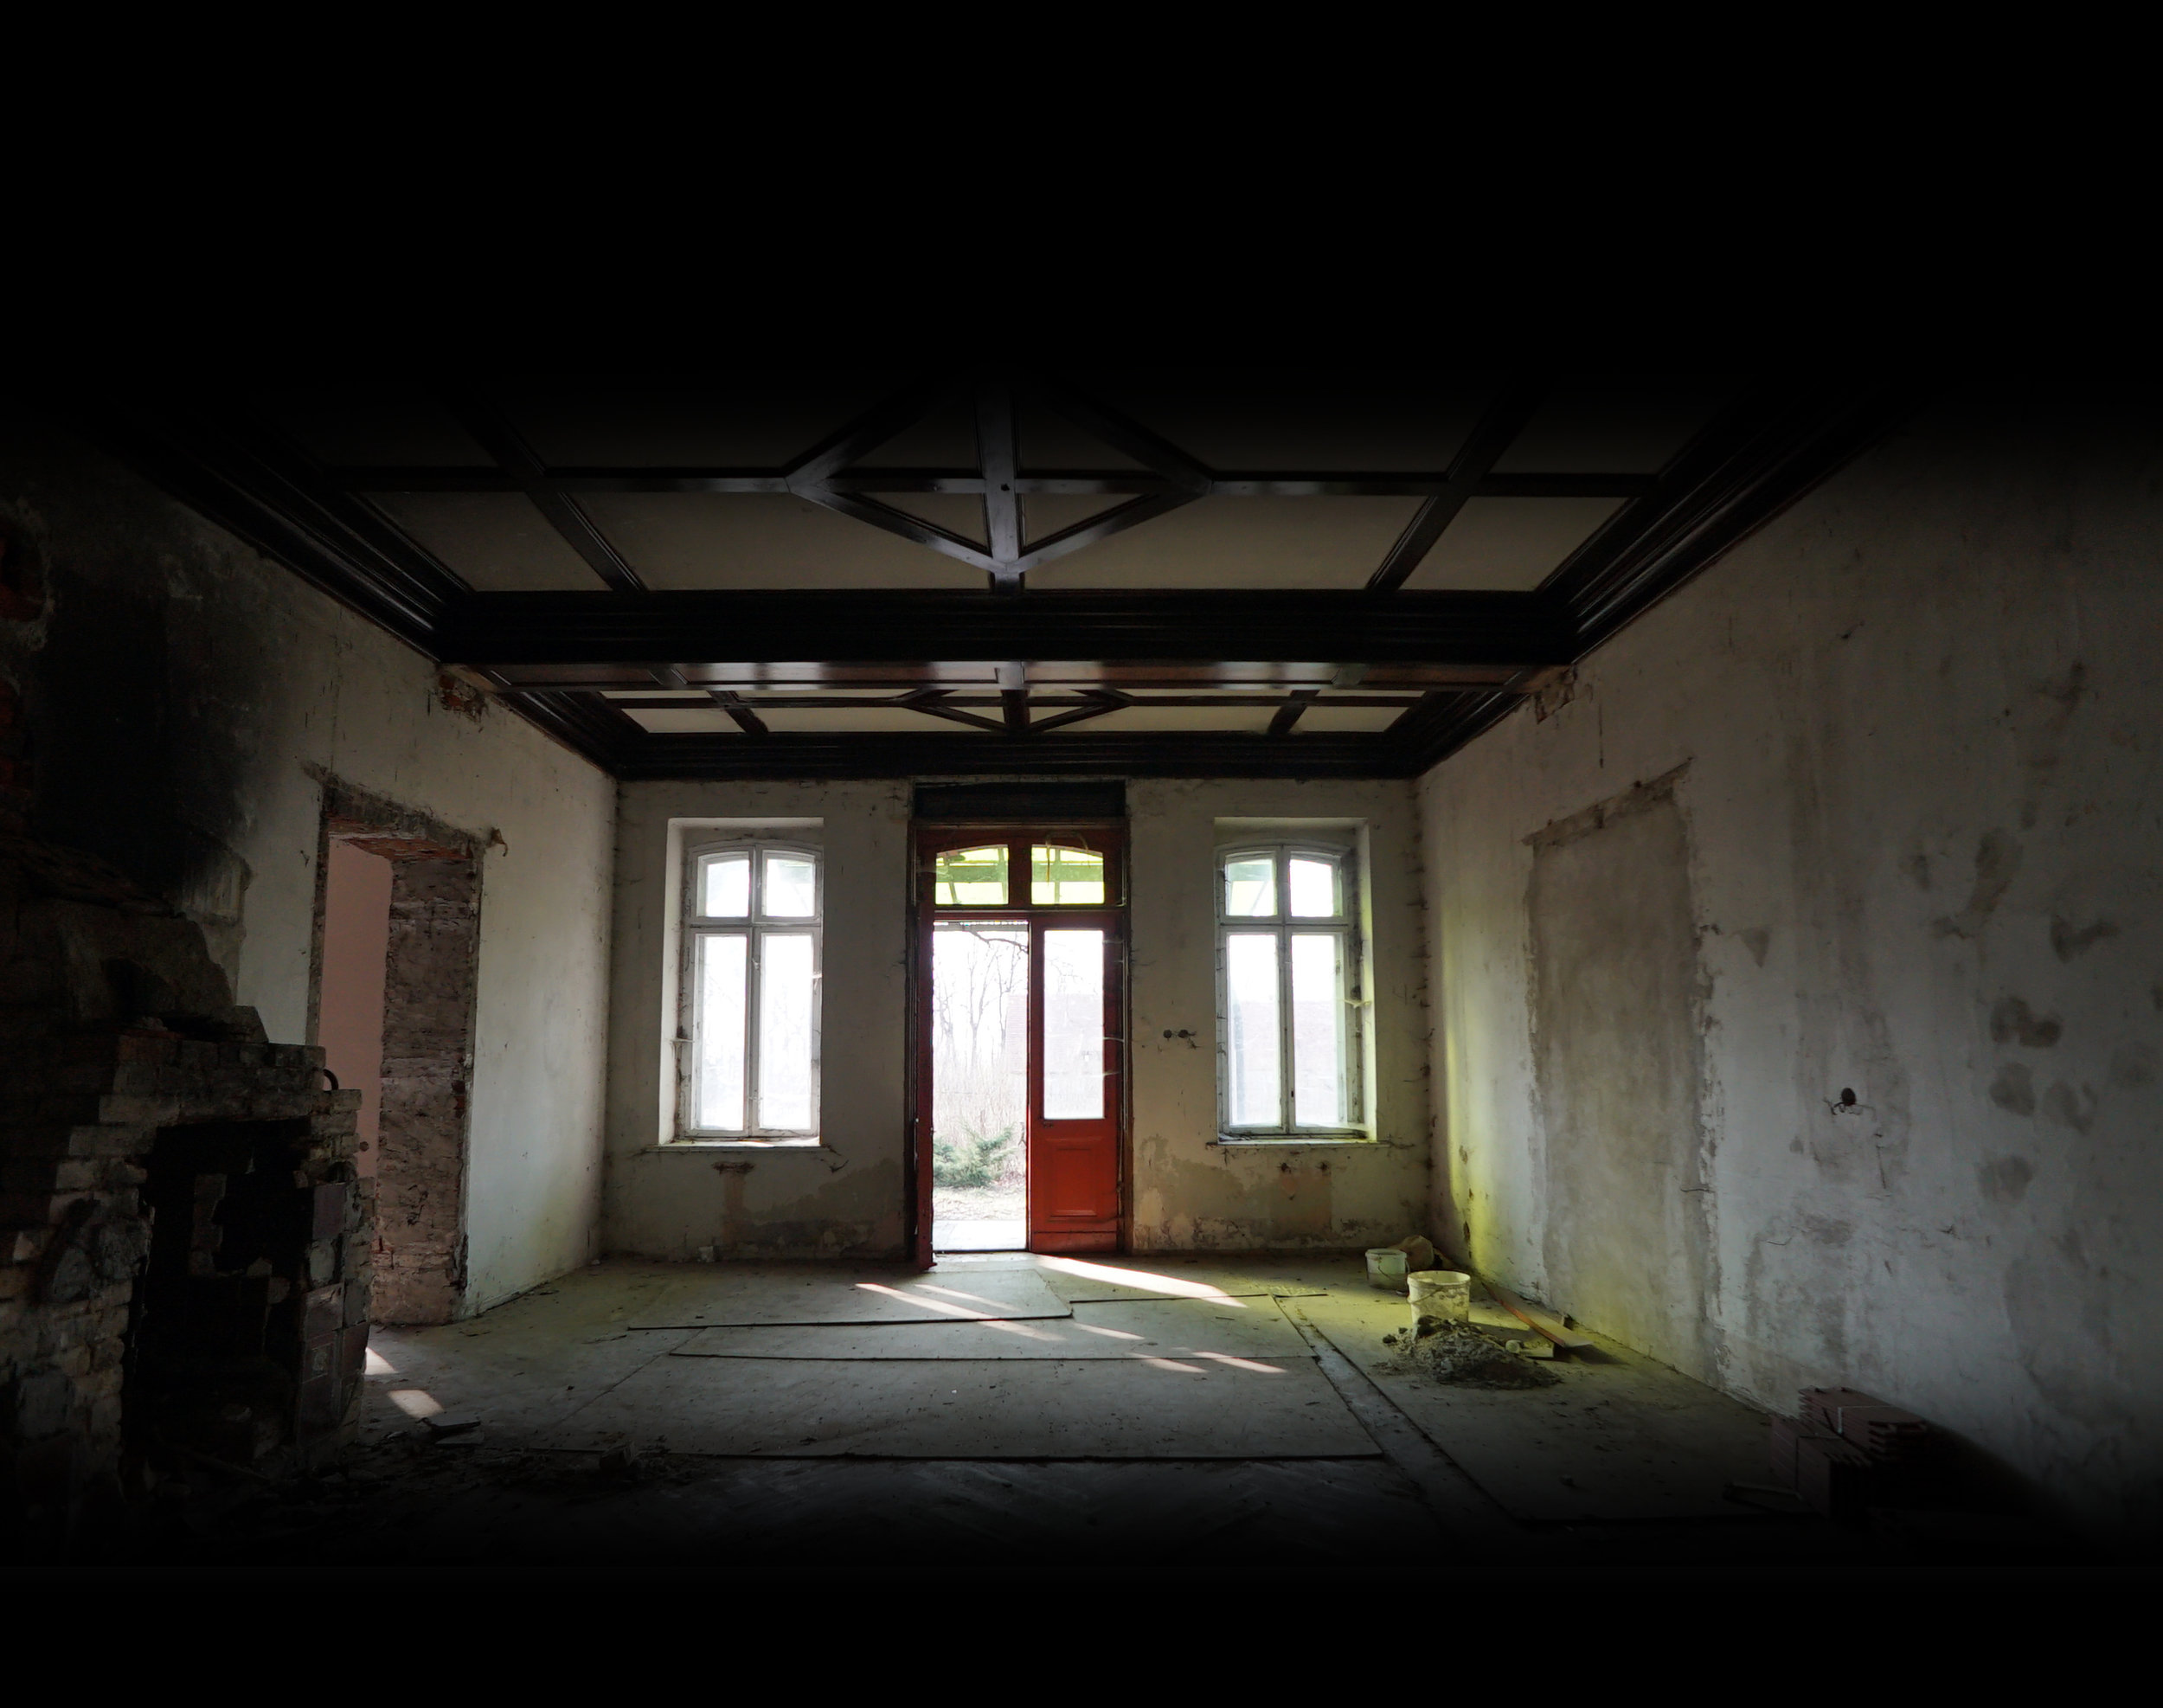 Manor house interior DSC00342.JPG